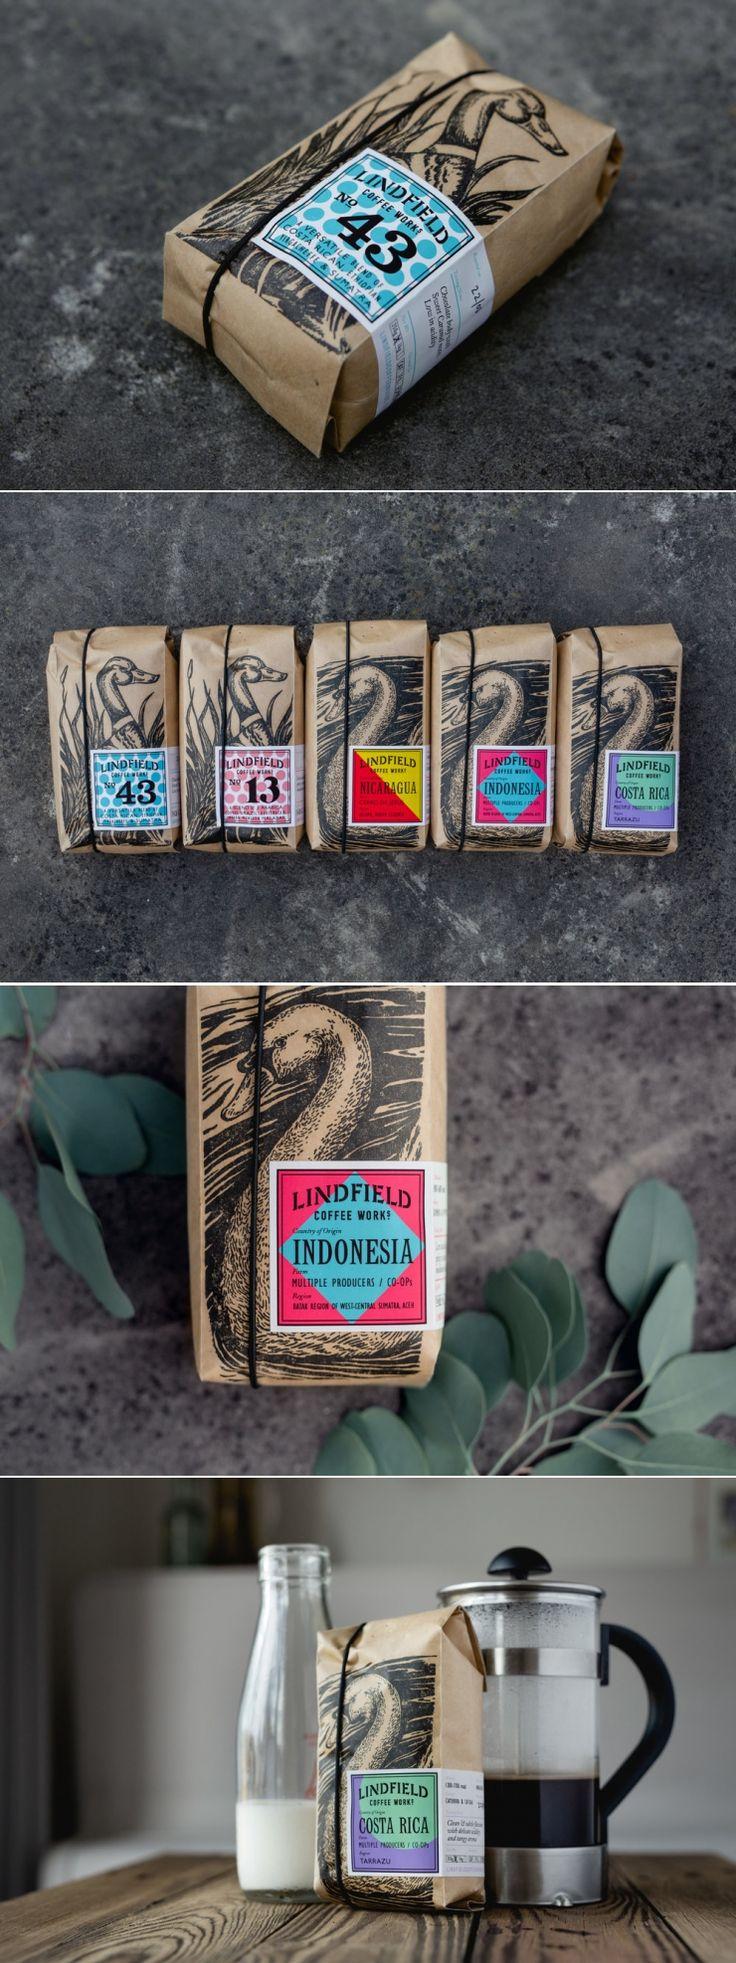 Lindfield Coffee Works Roastery and Coffee Bar — The Dieline - Branding & Packaging Design